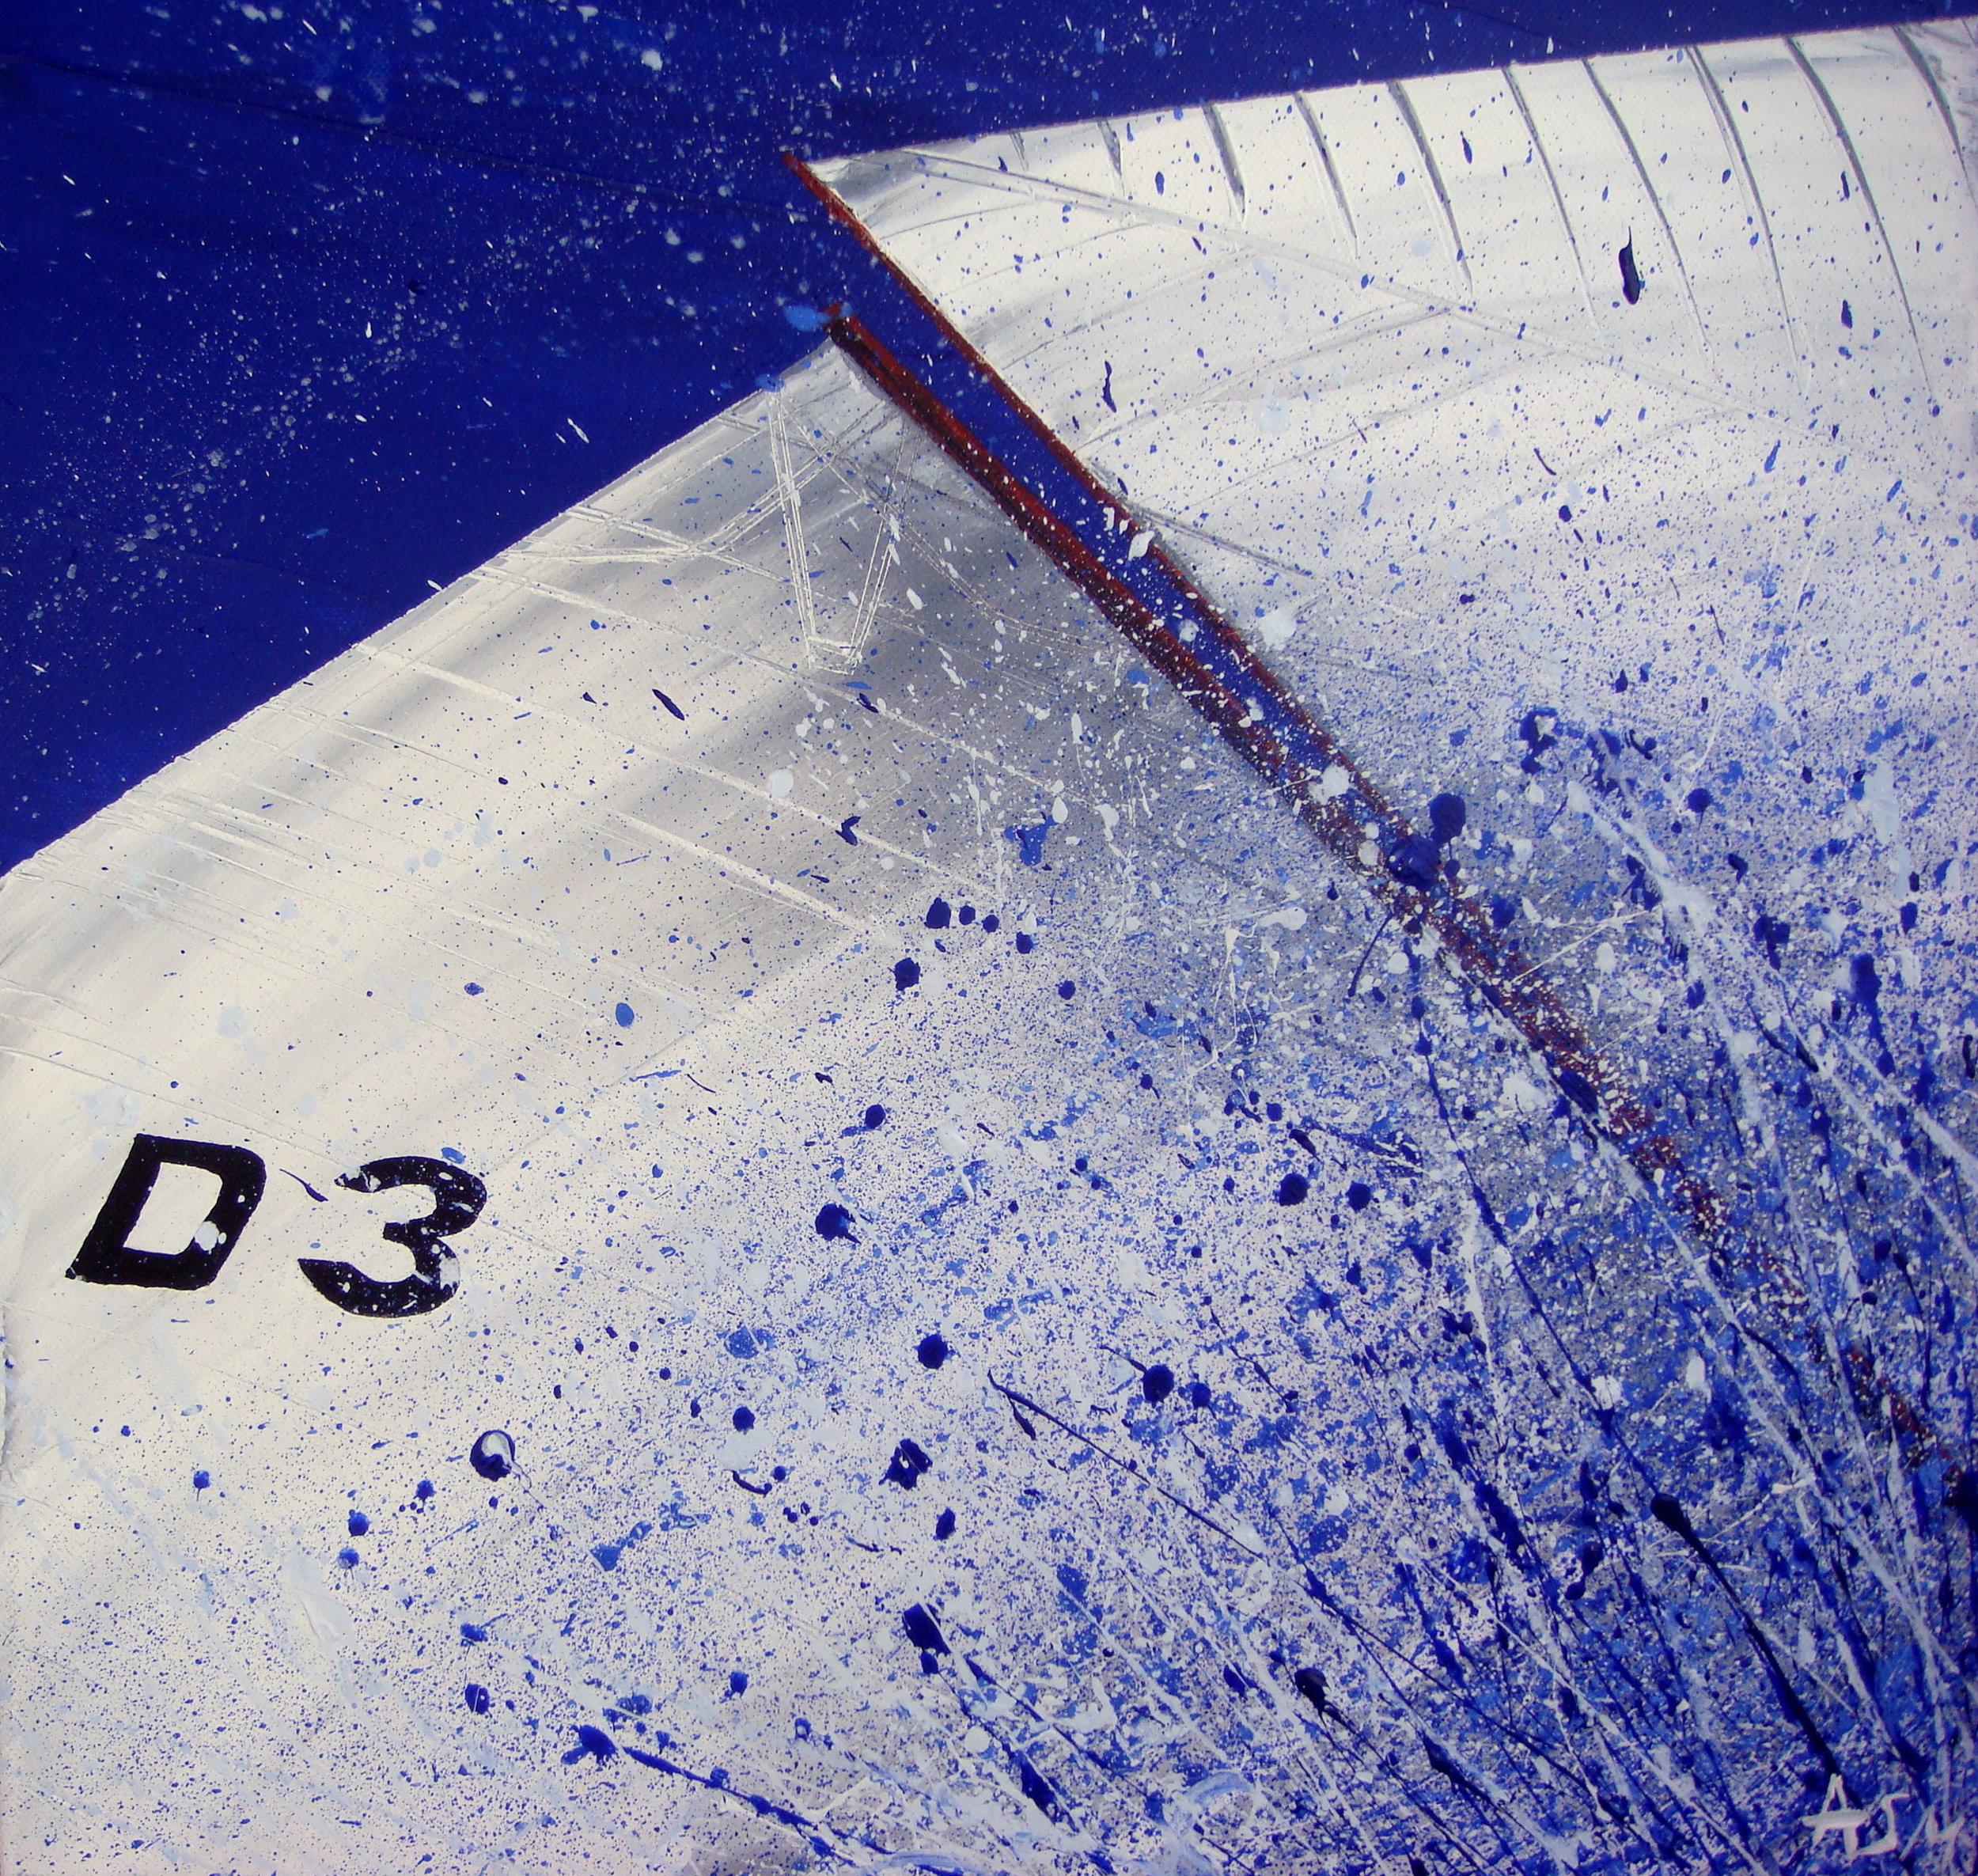 Sail Number D3